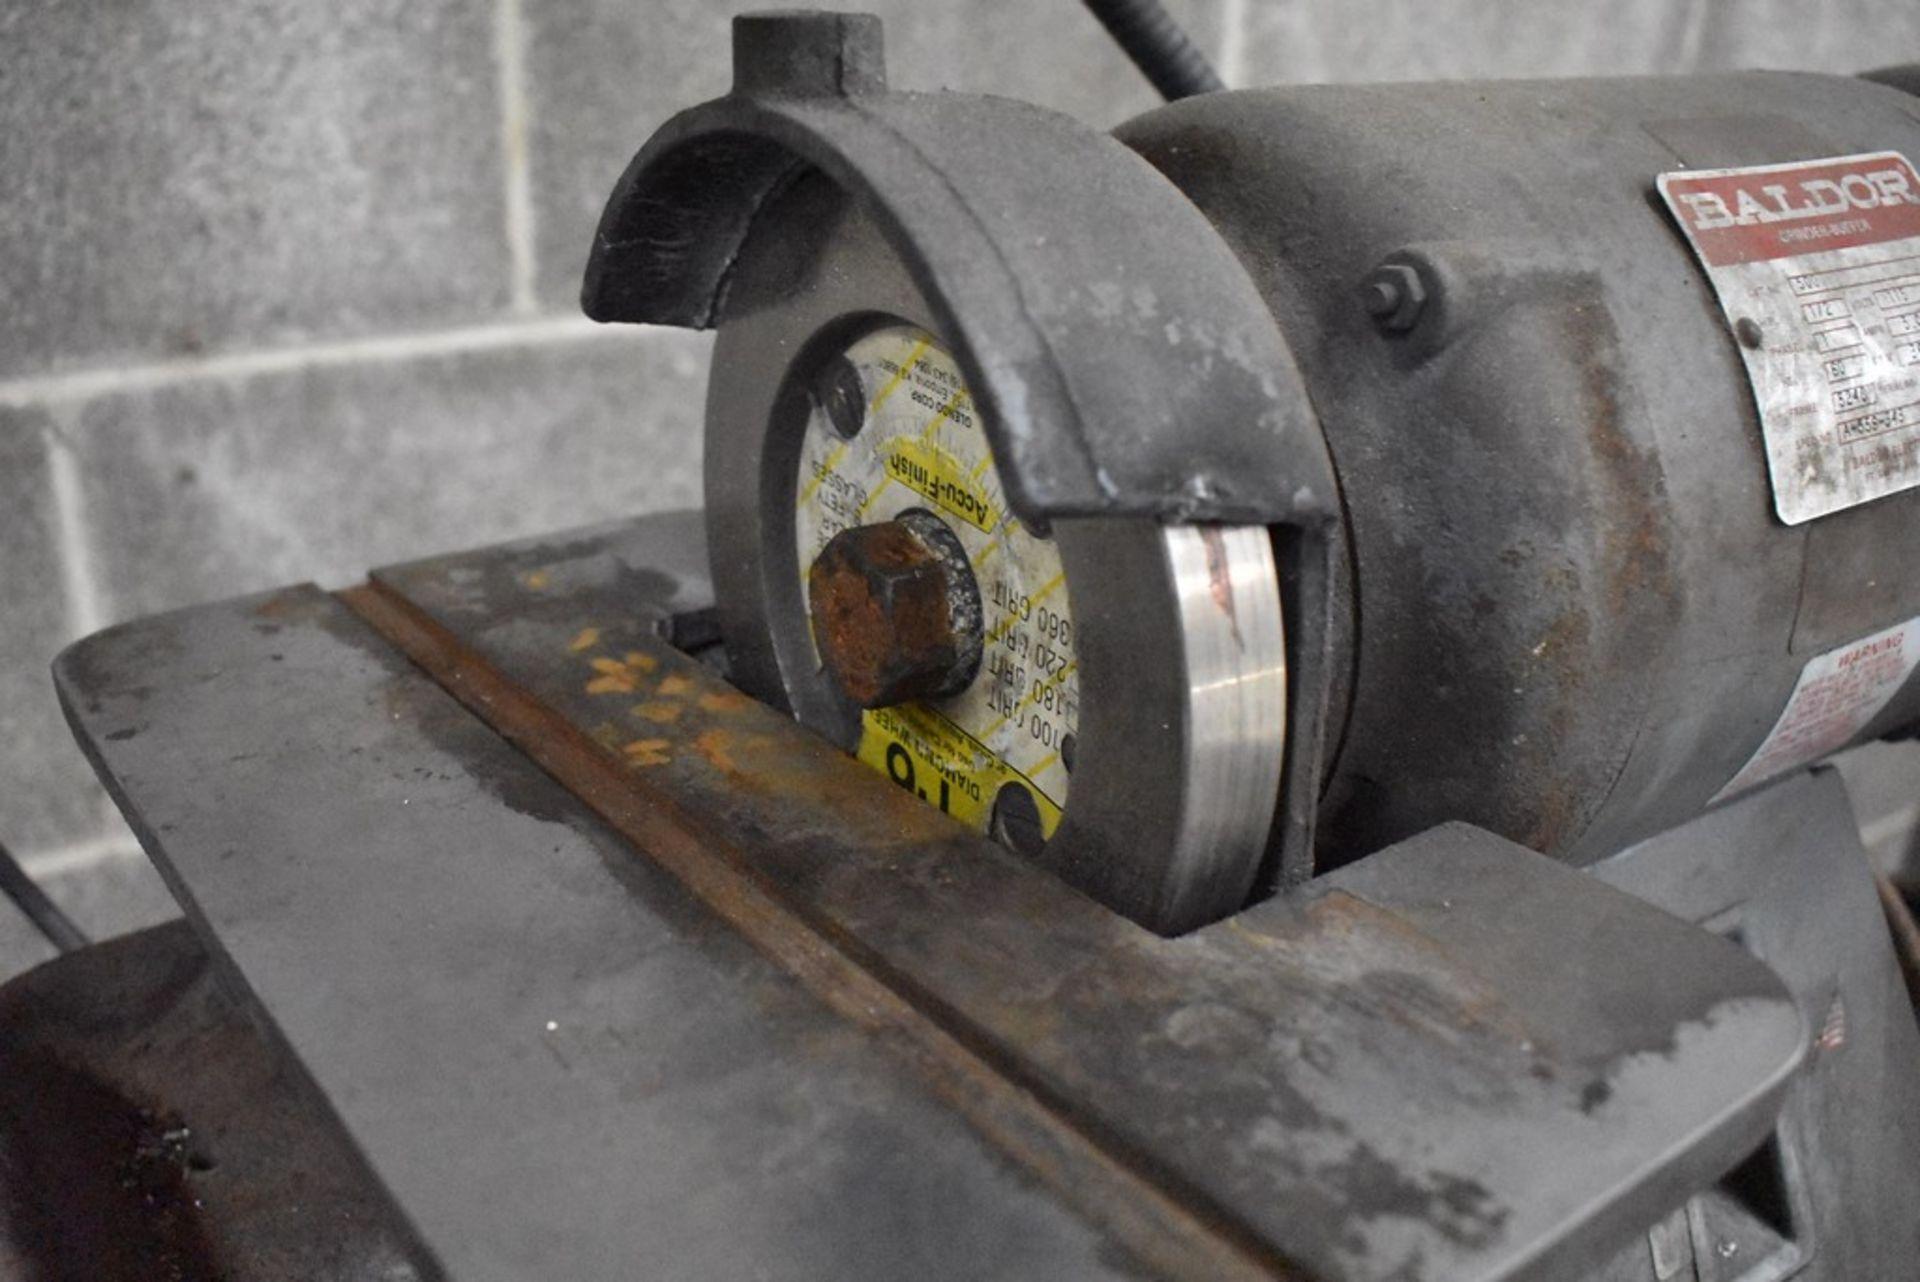 BALDOR ½ HP PEDESTAL DOUBLE END CARBIDE TOOL GRINDER, S/N A-559-343 - Image 2 of 7